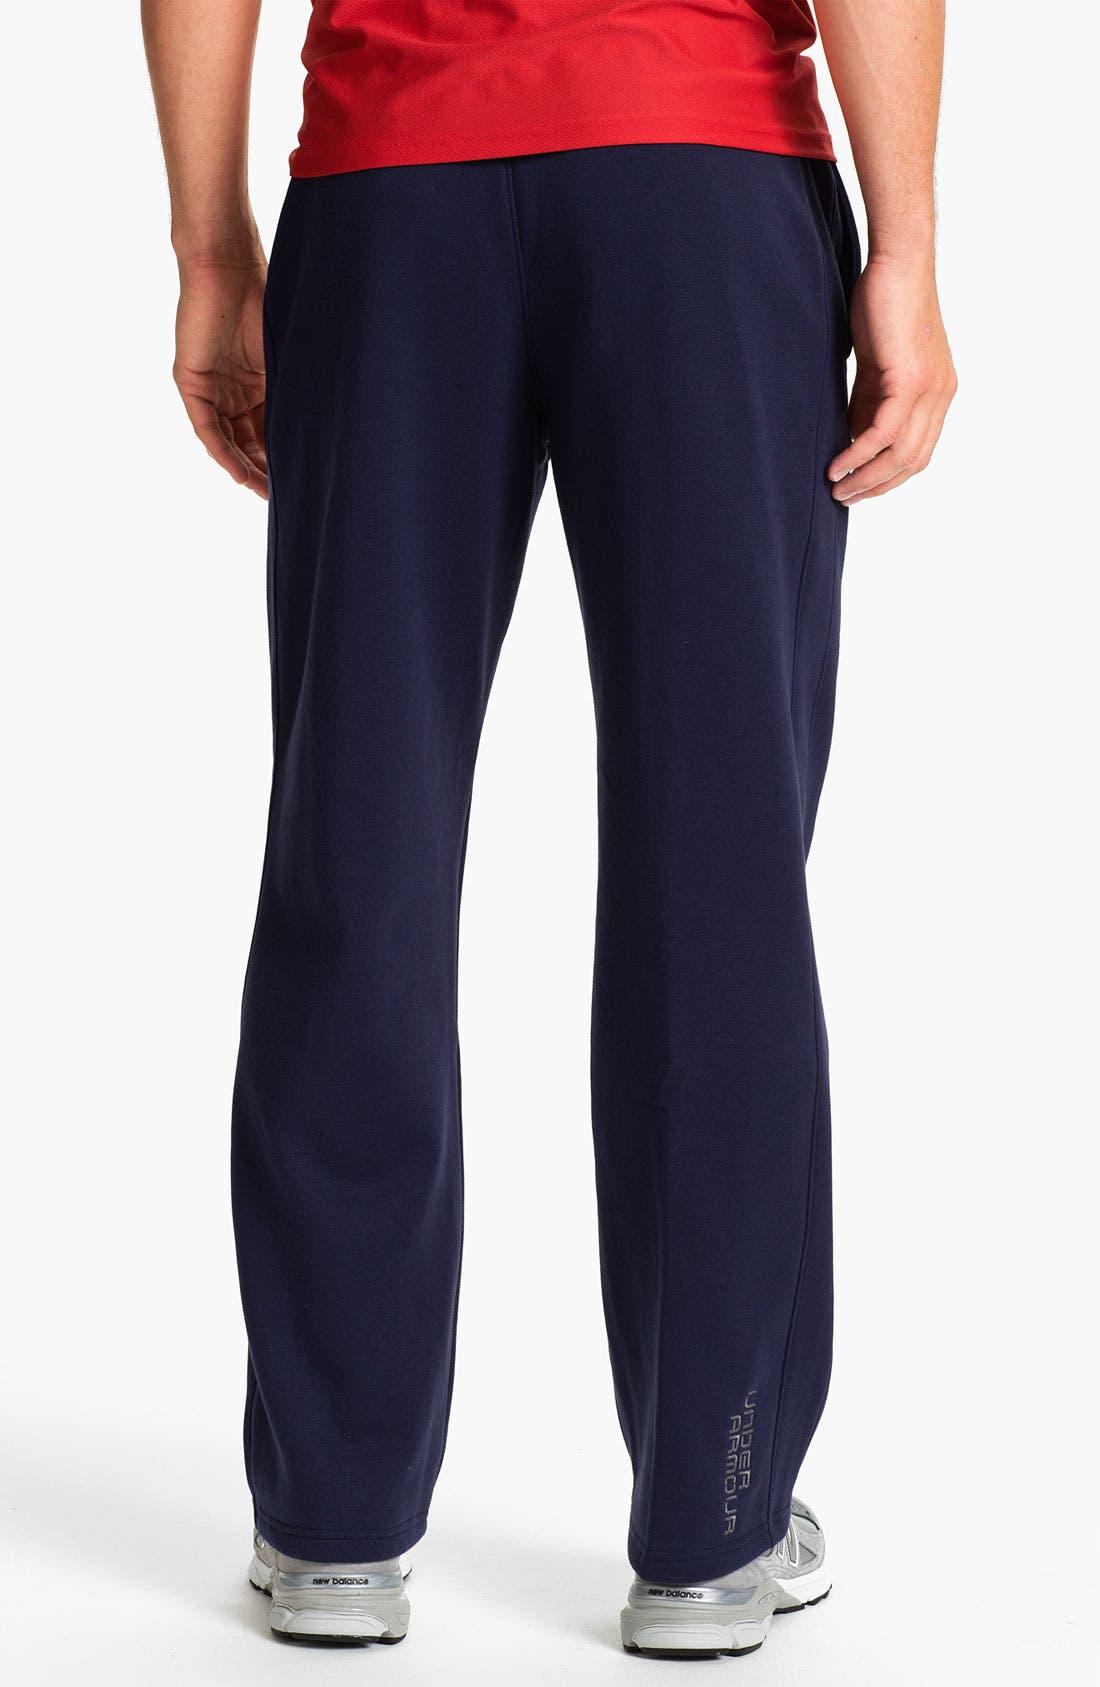 Alternate Image 2  - Under Armour Charged Cotton® Storm Fleece Pants